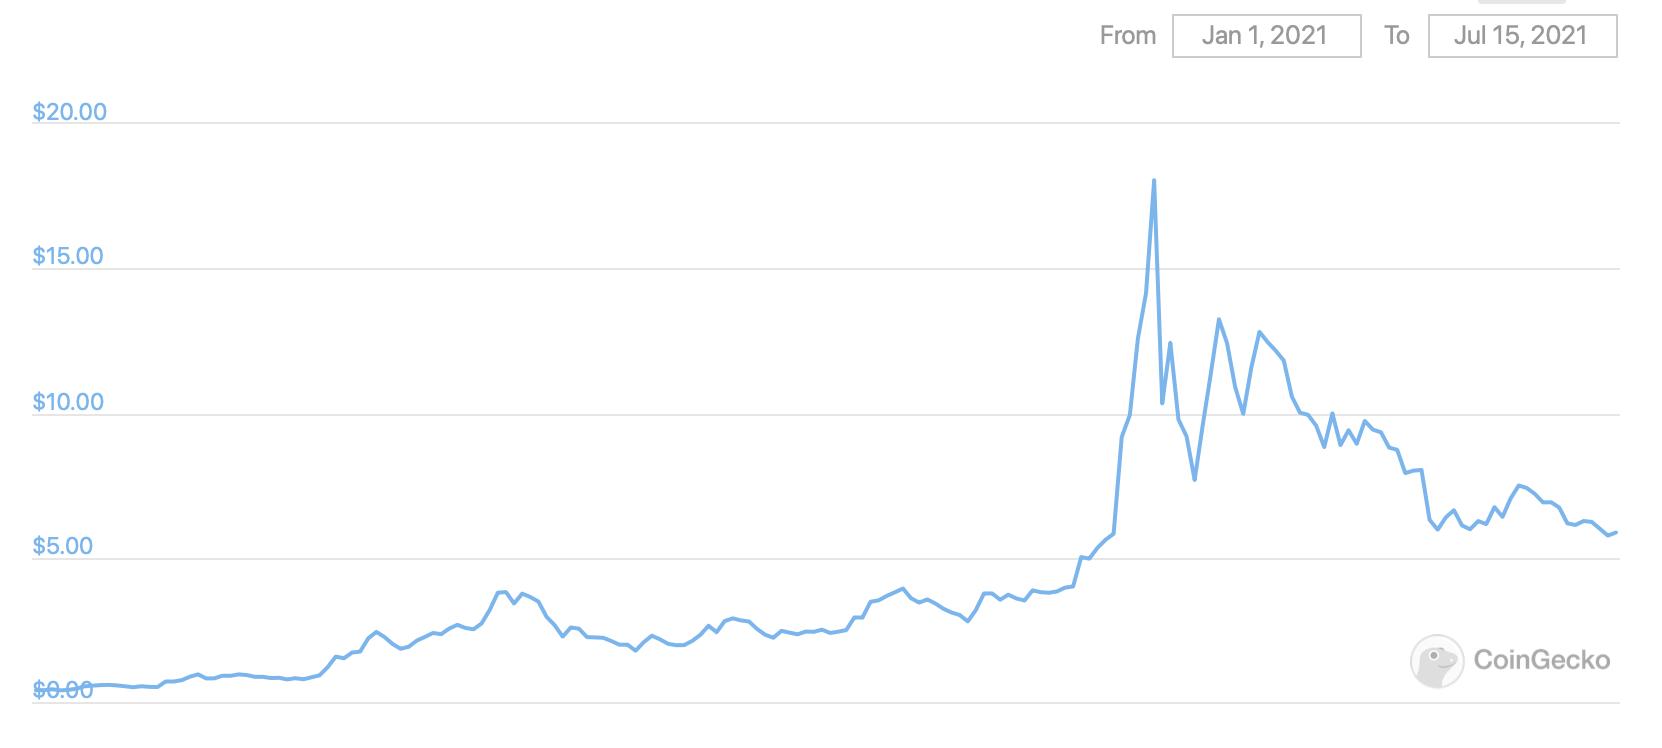 ergo криптовалюты блокчейн